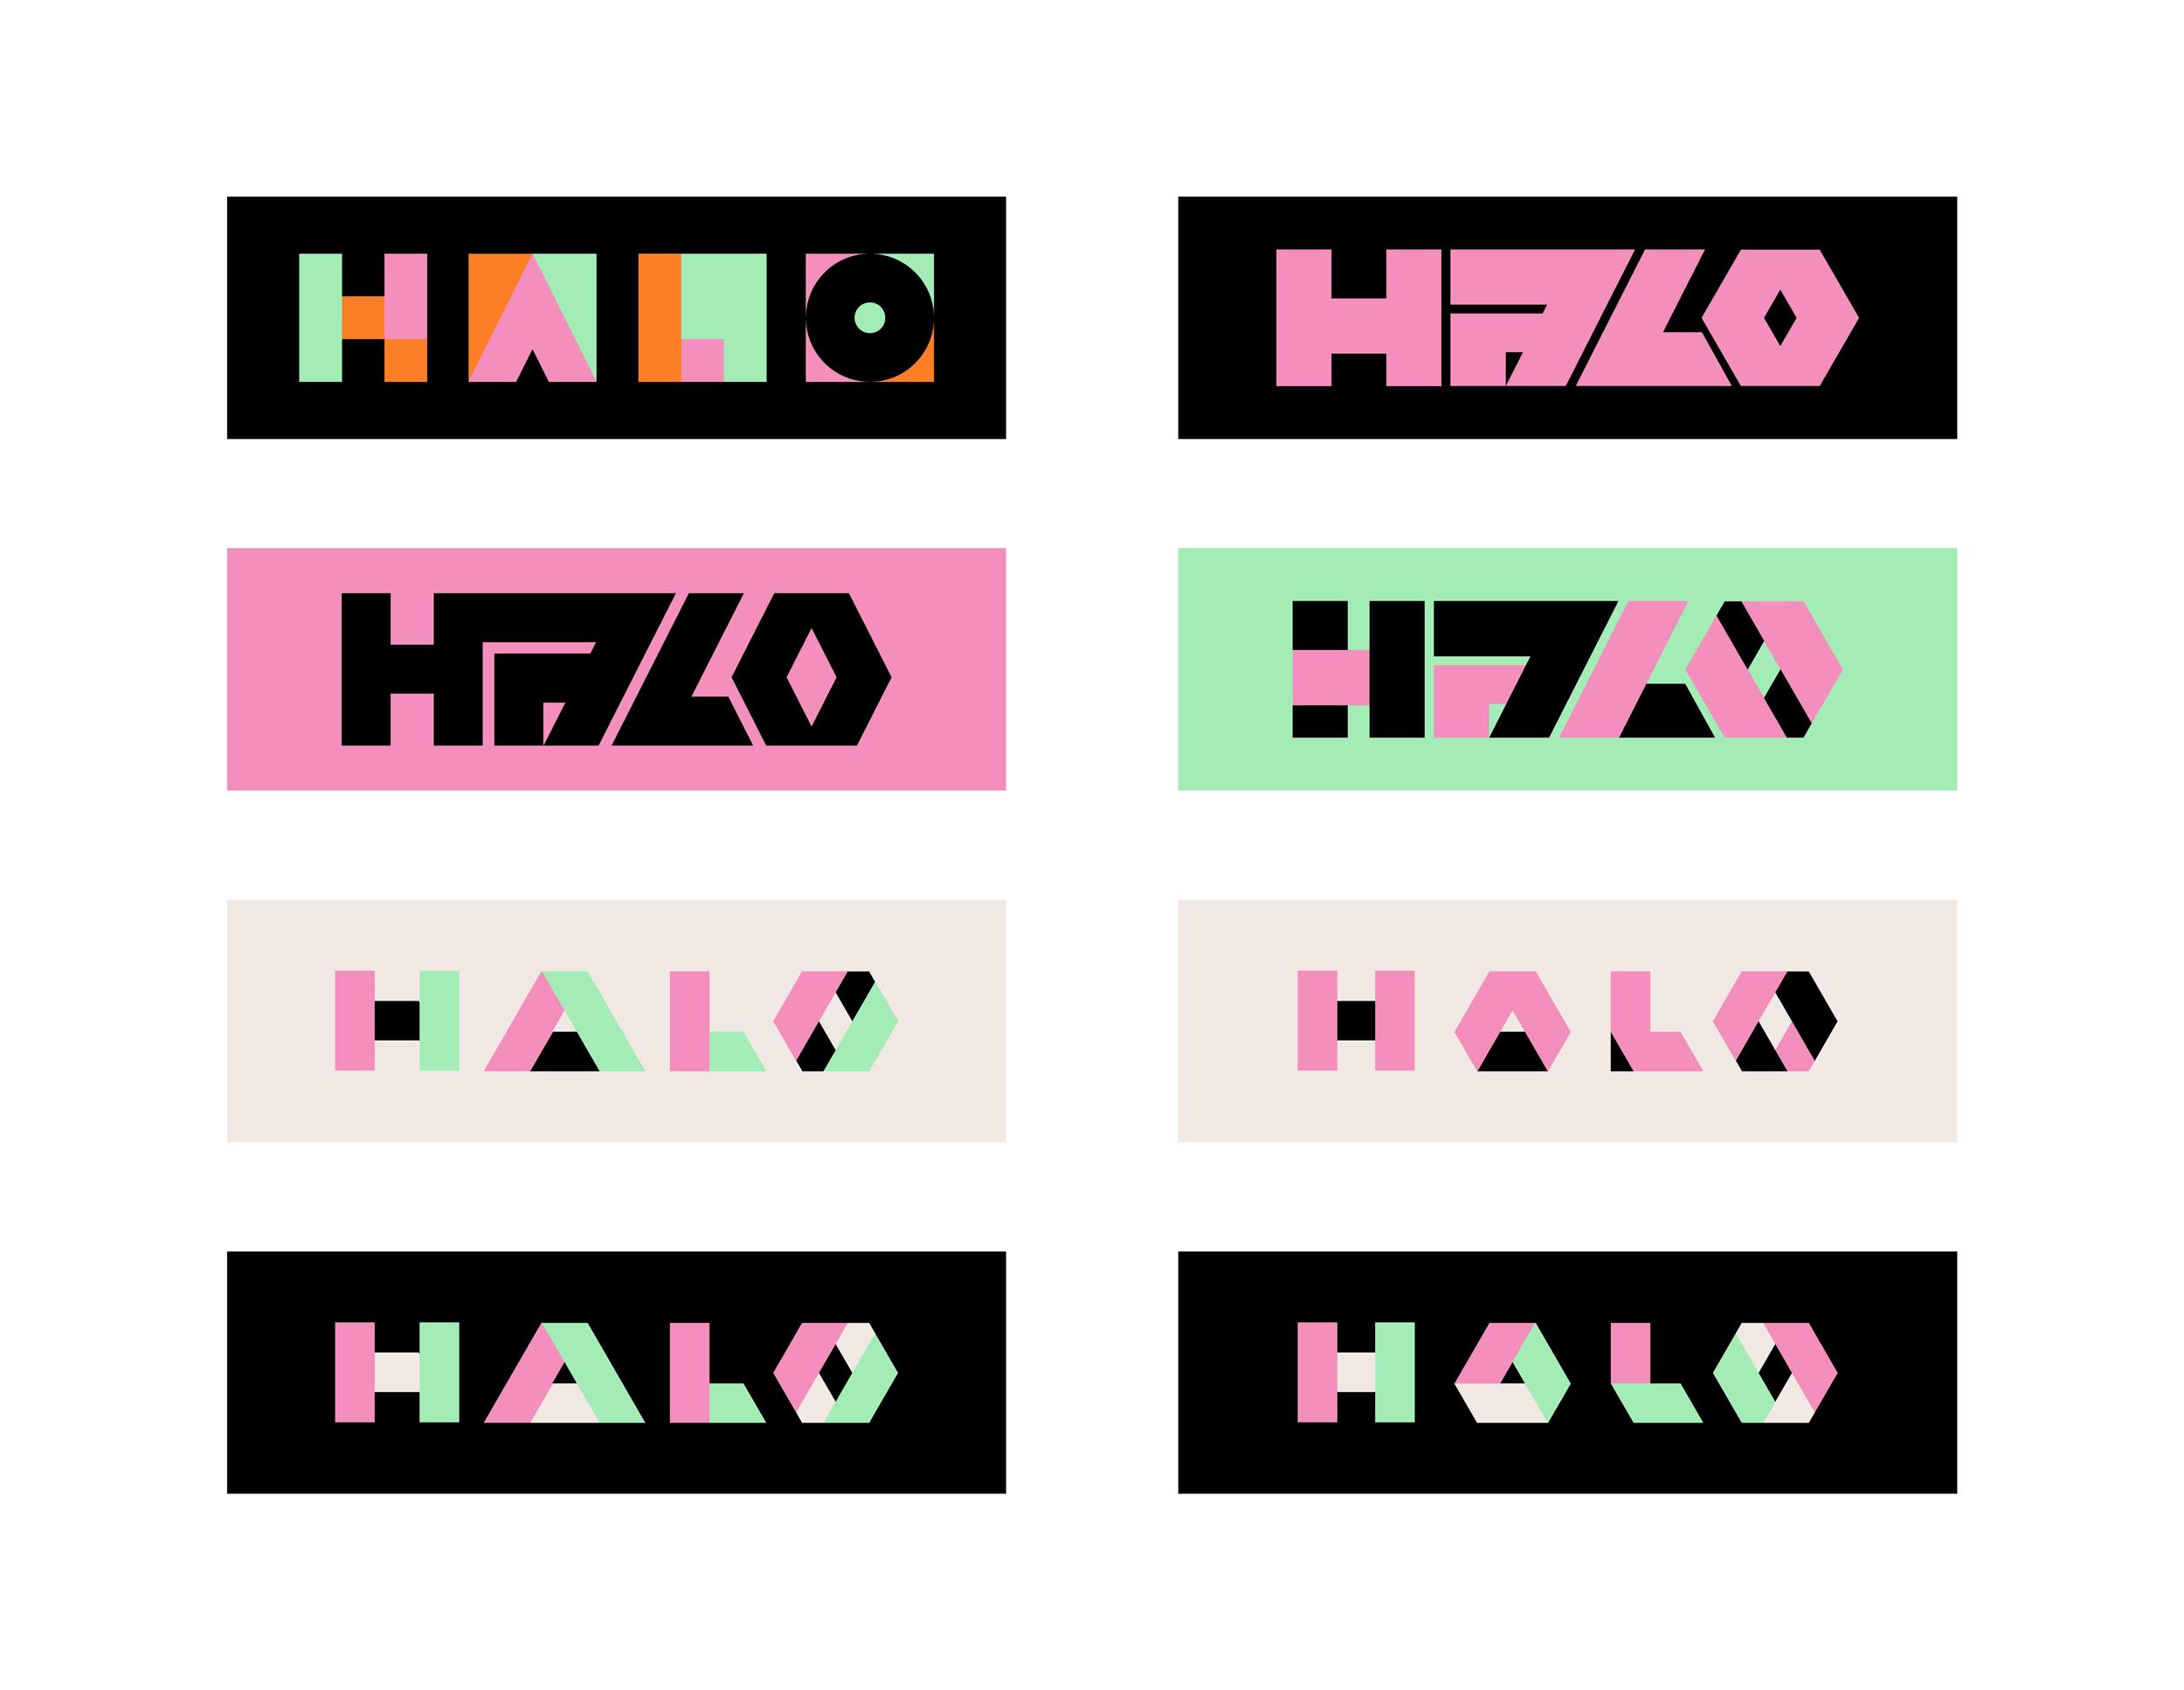 HALO_Justin-Harder_02.jpg